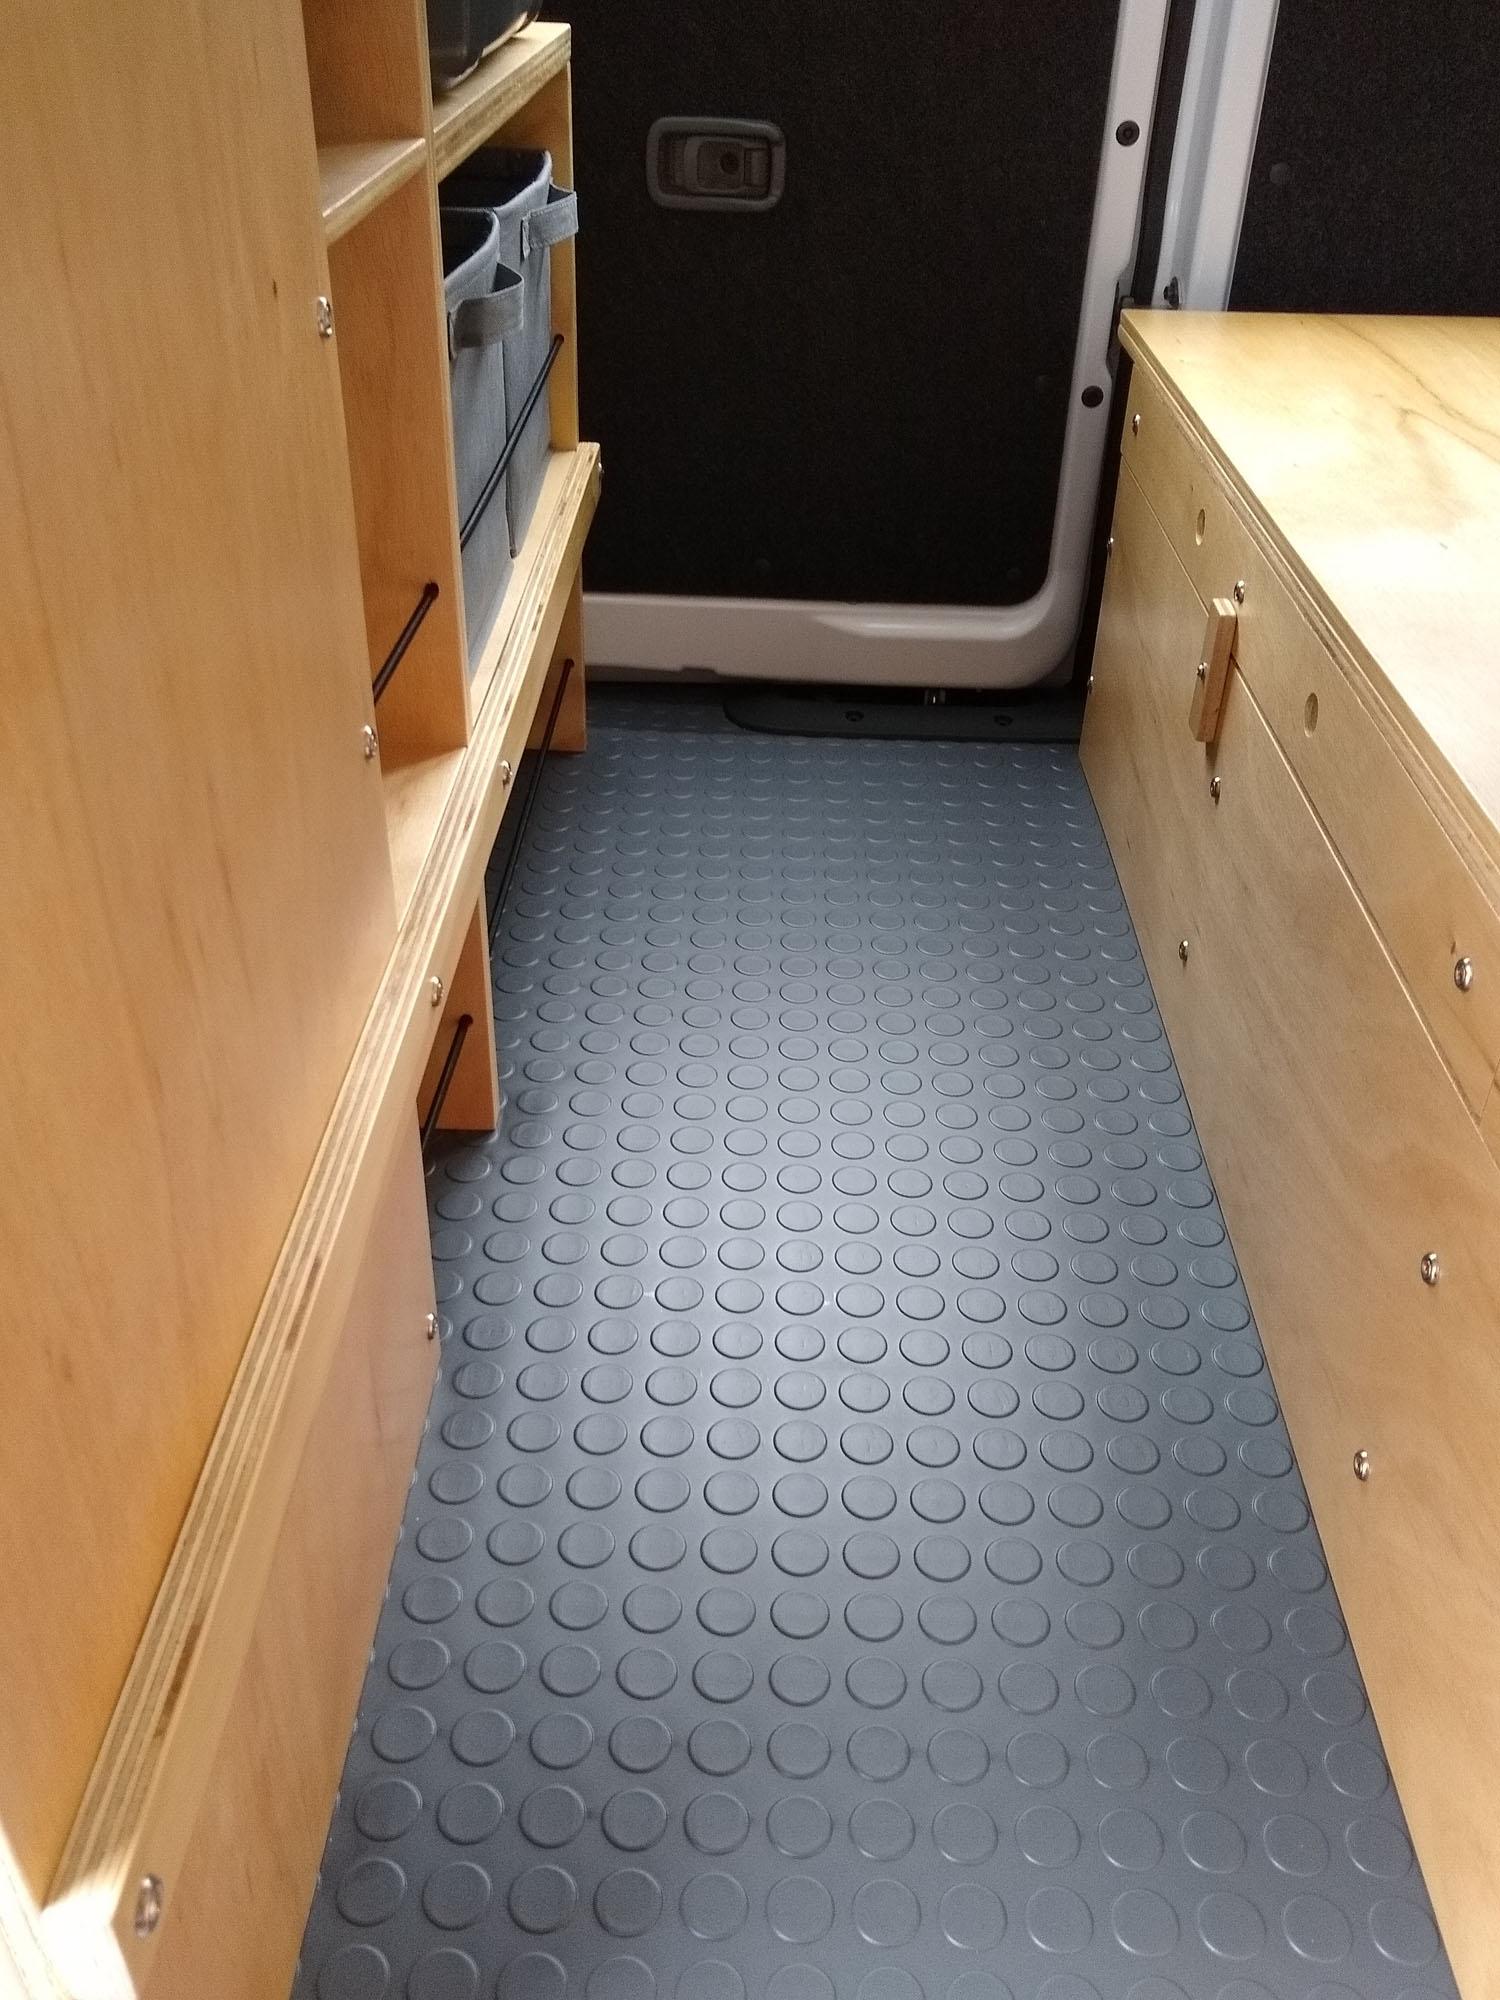 Nissan NV200 Camper Van Conversion - Floor 4